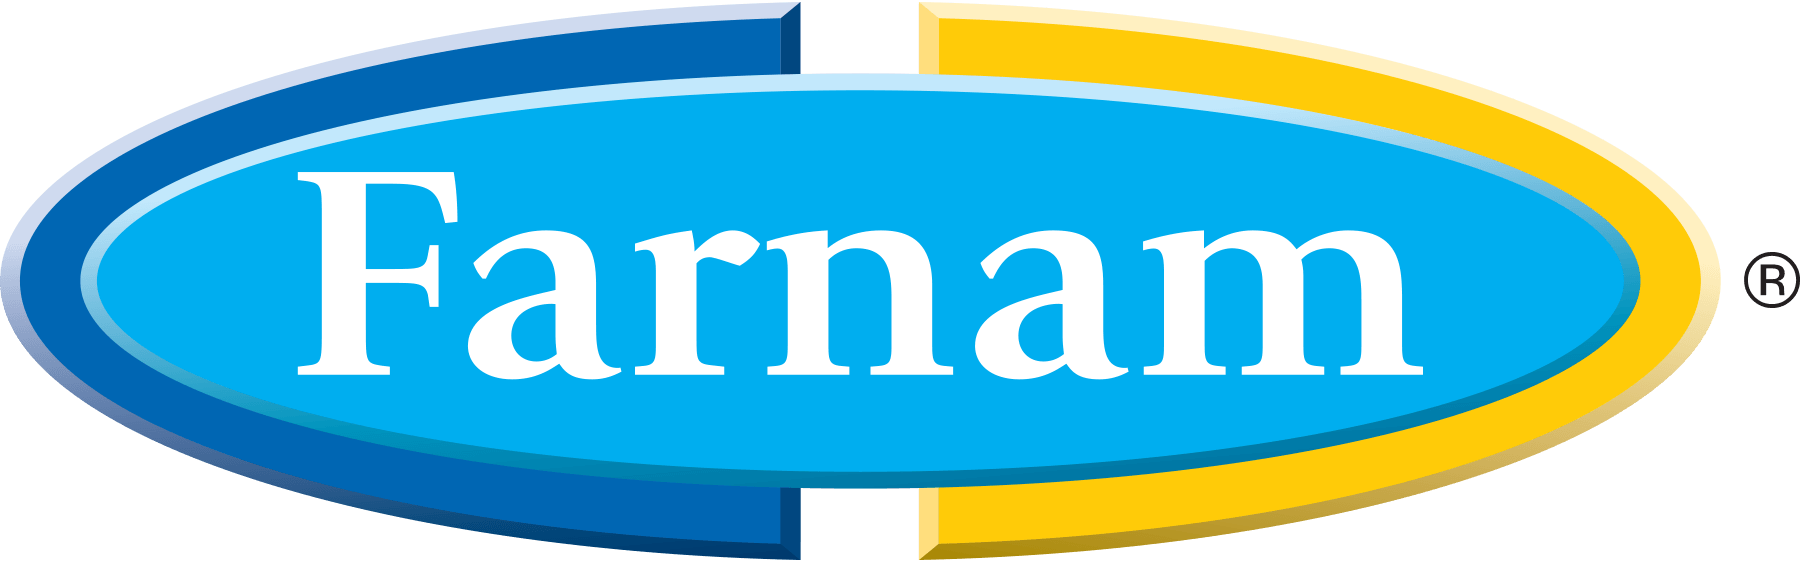 The Farnam logo.